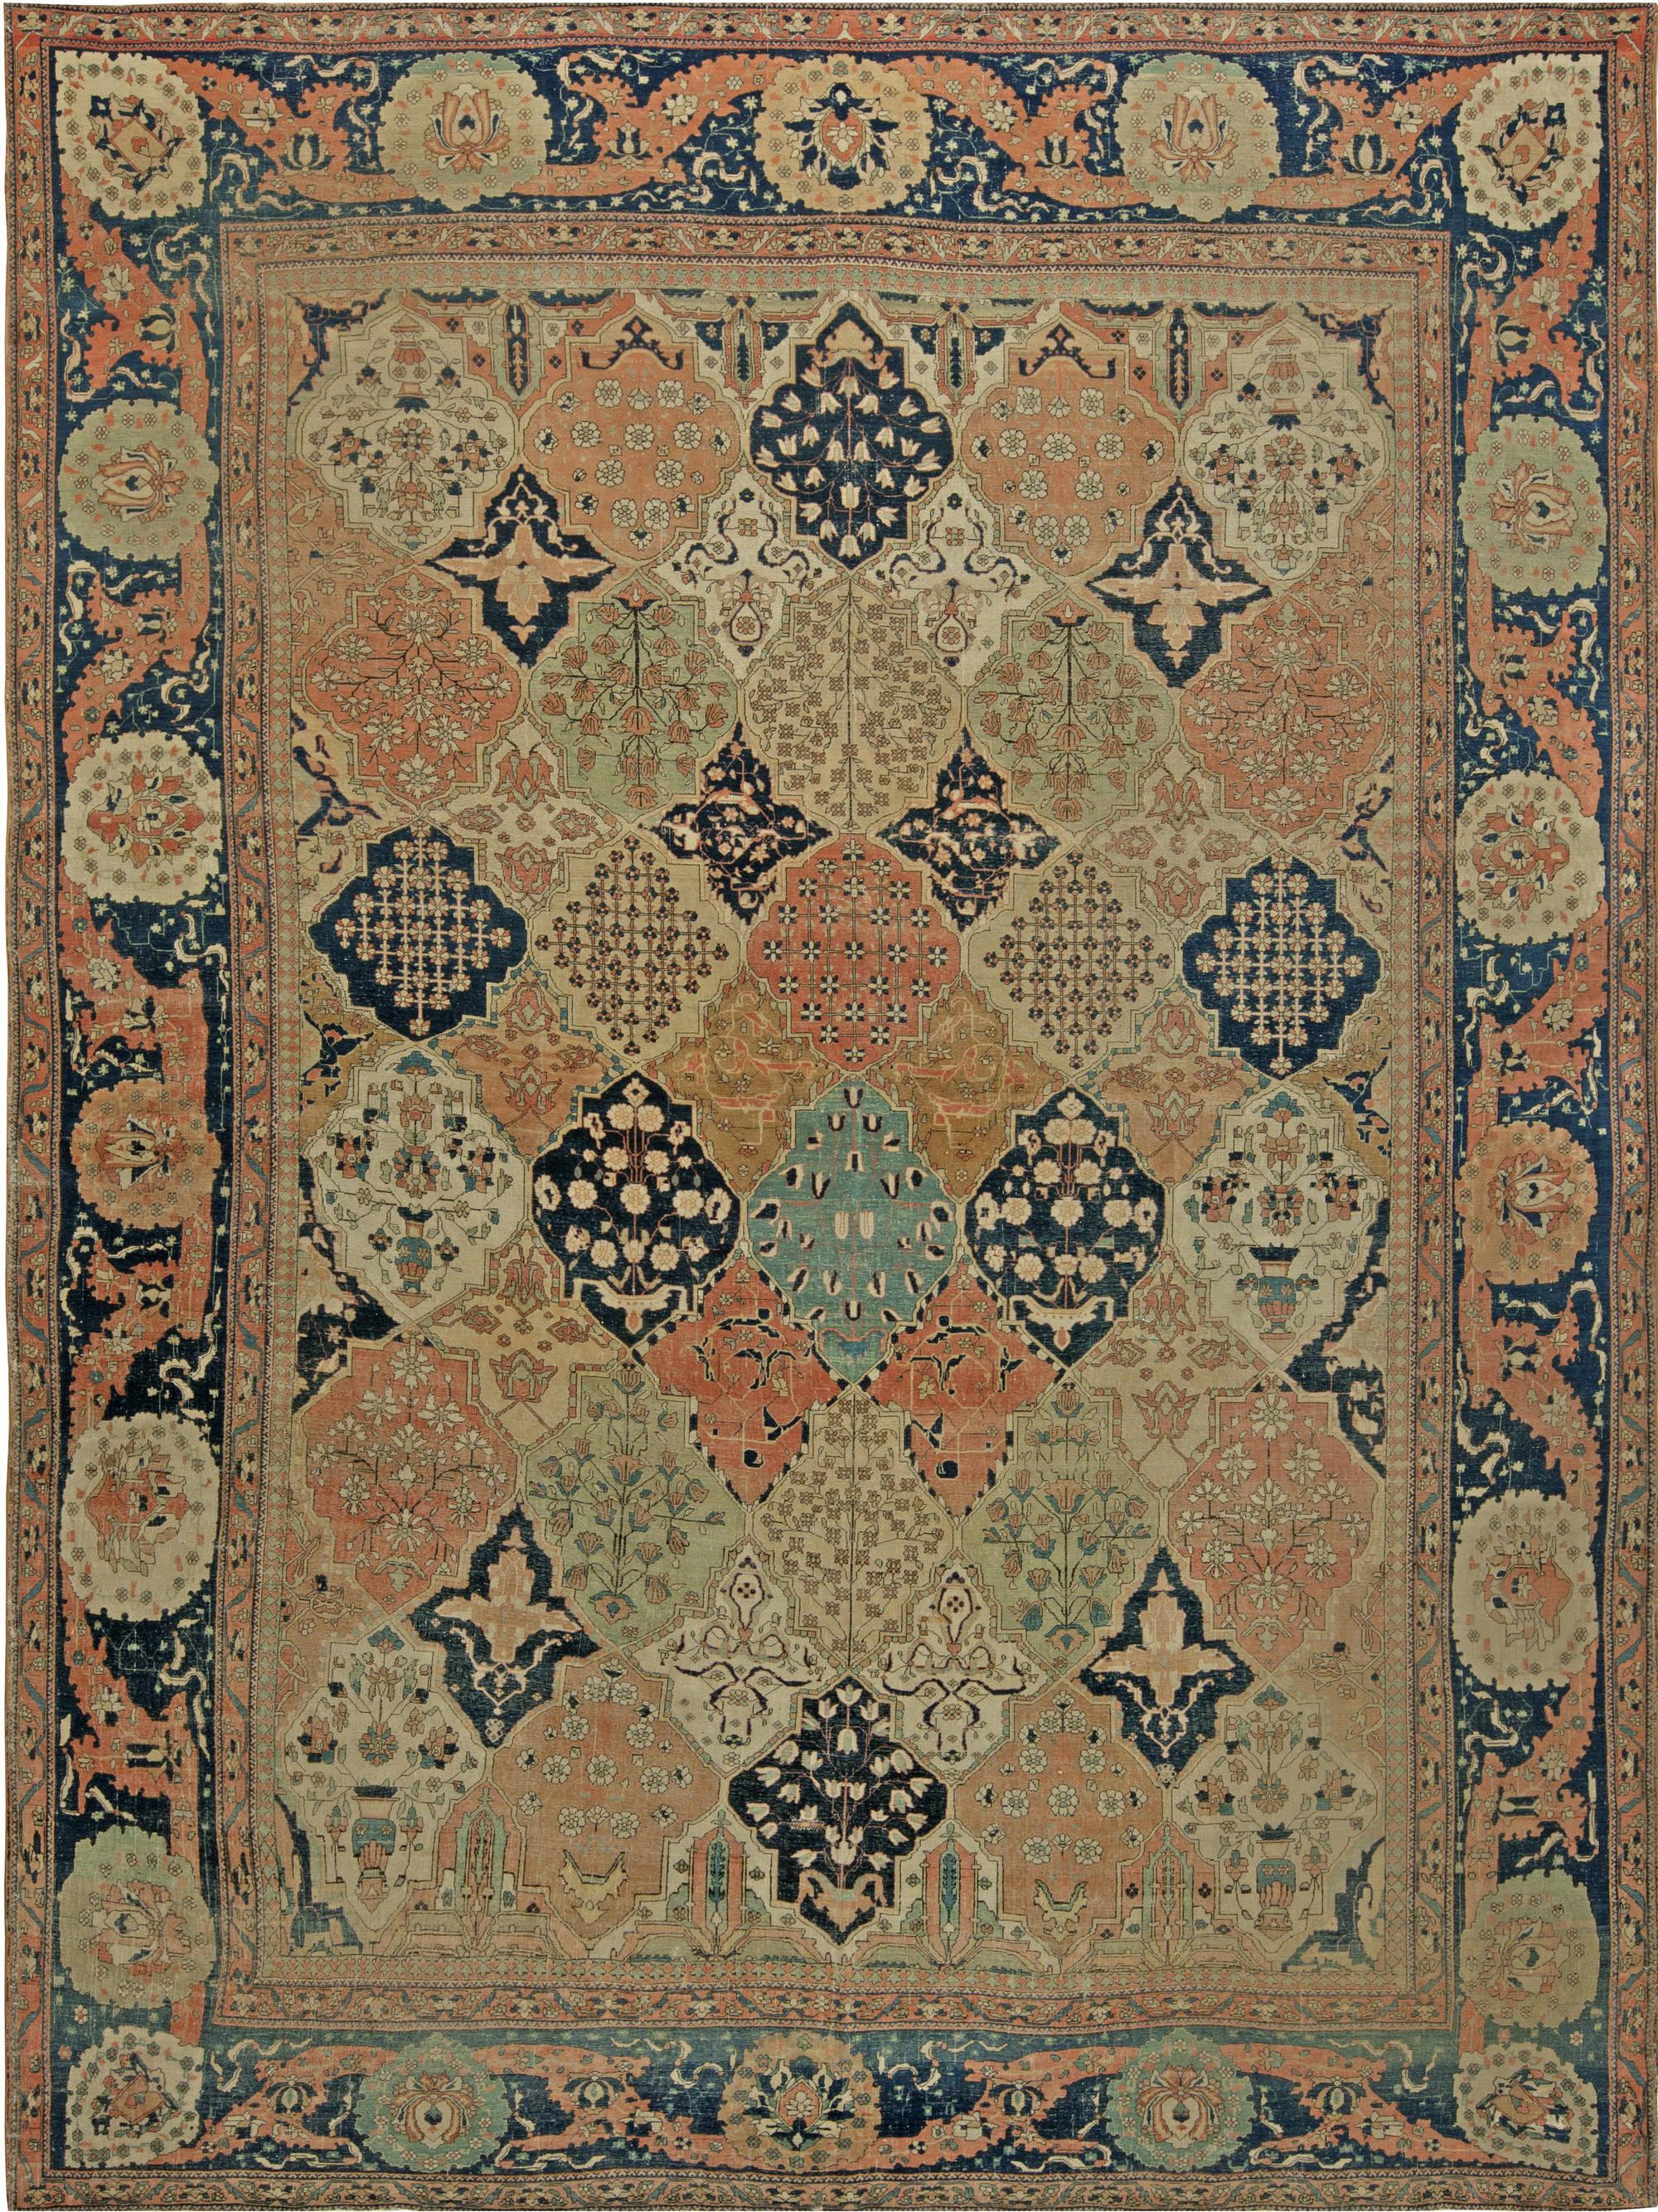 Antique Persian Mohtashem Kashan Rug BB6831